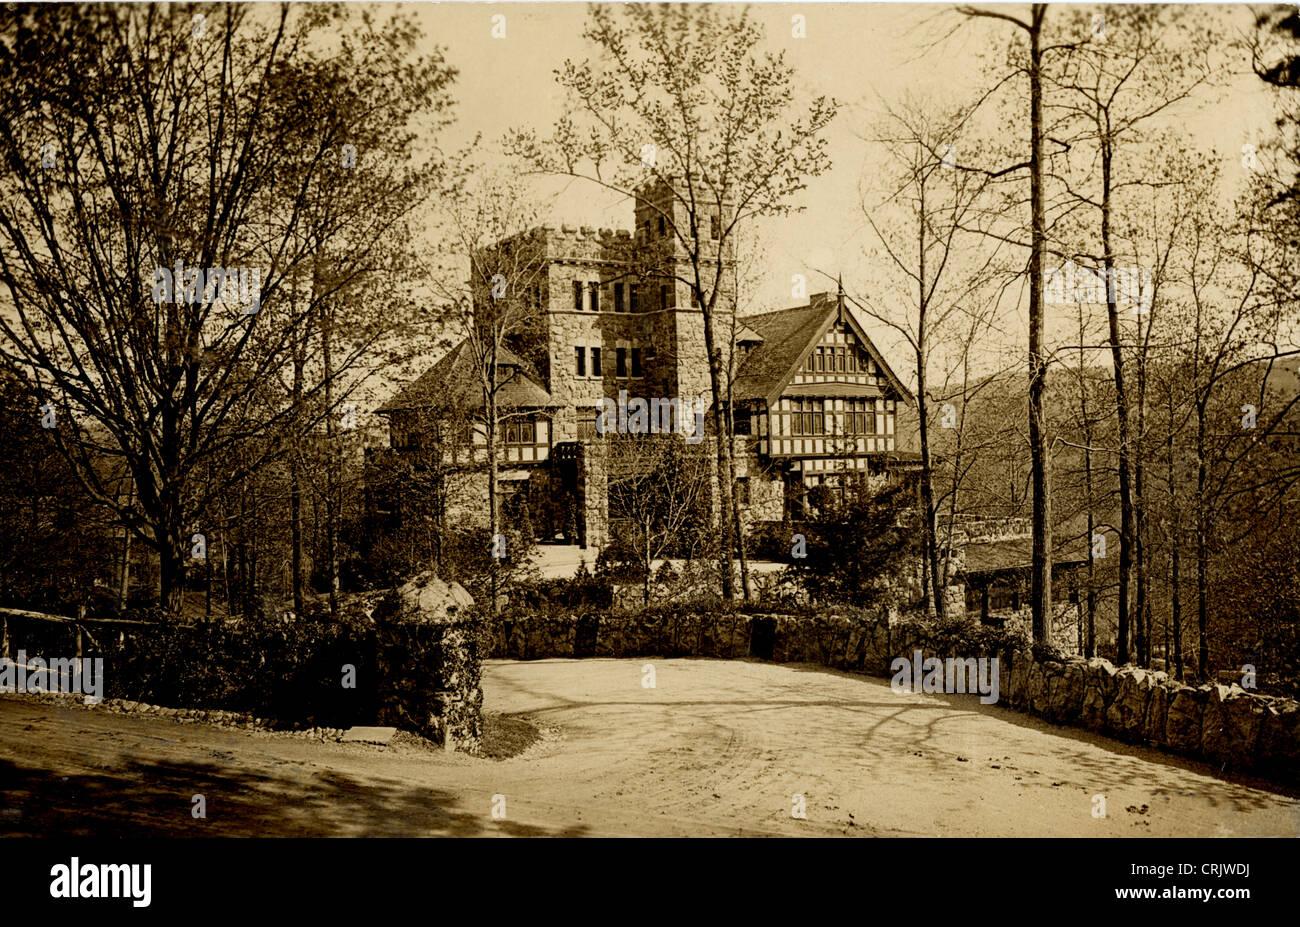 Huge Fortified English Tudor Mansion - Stock Image